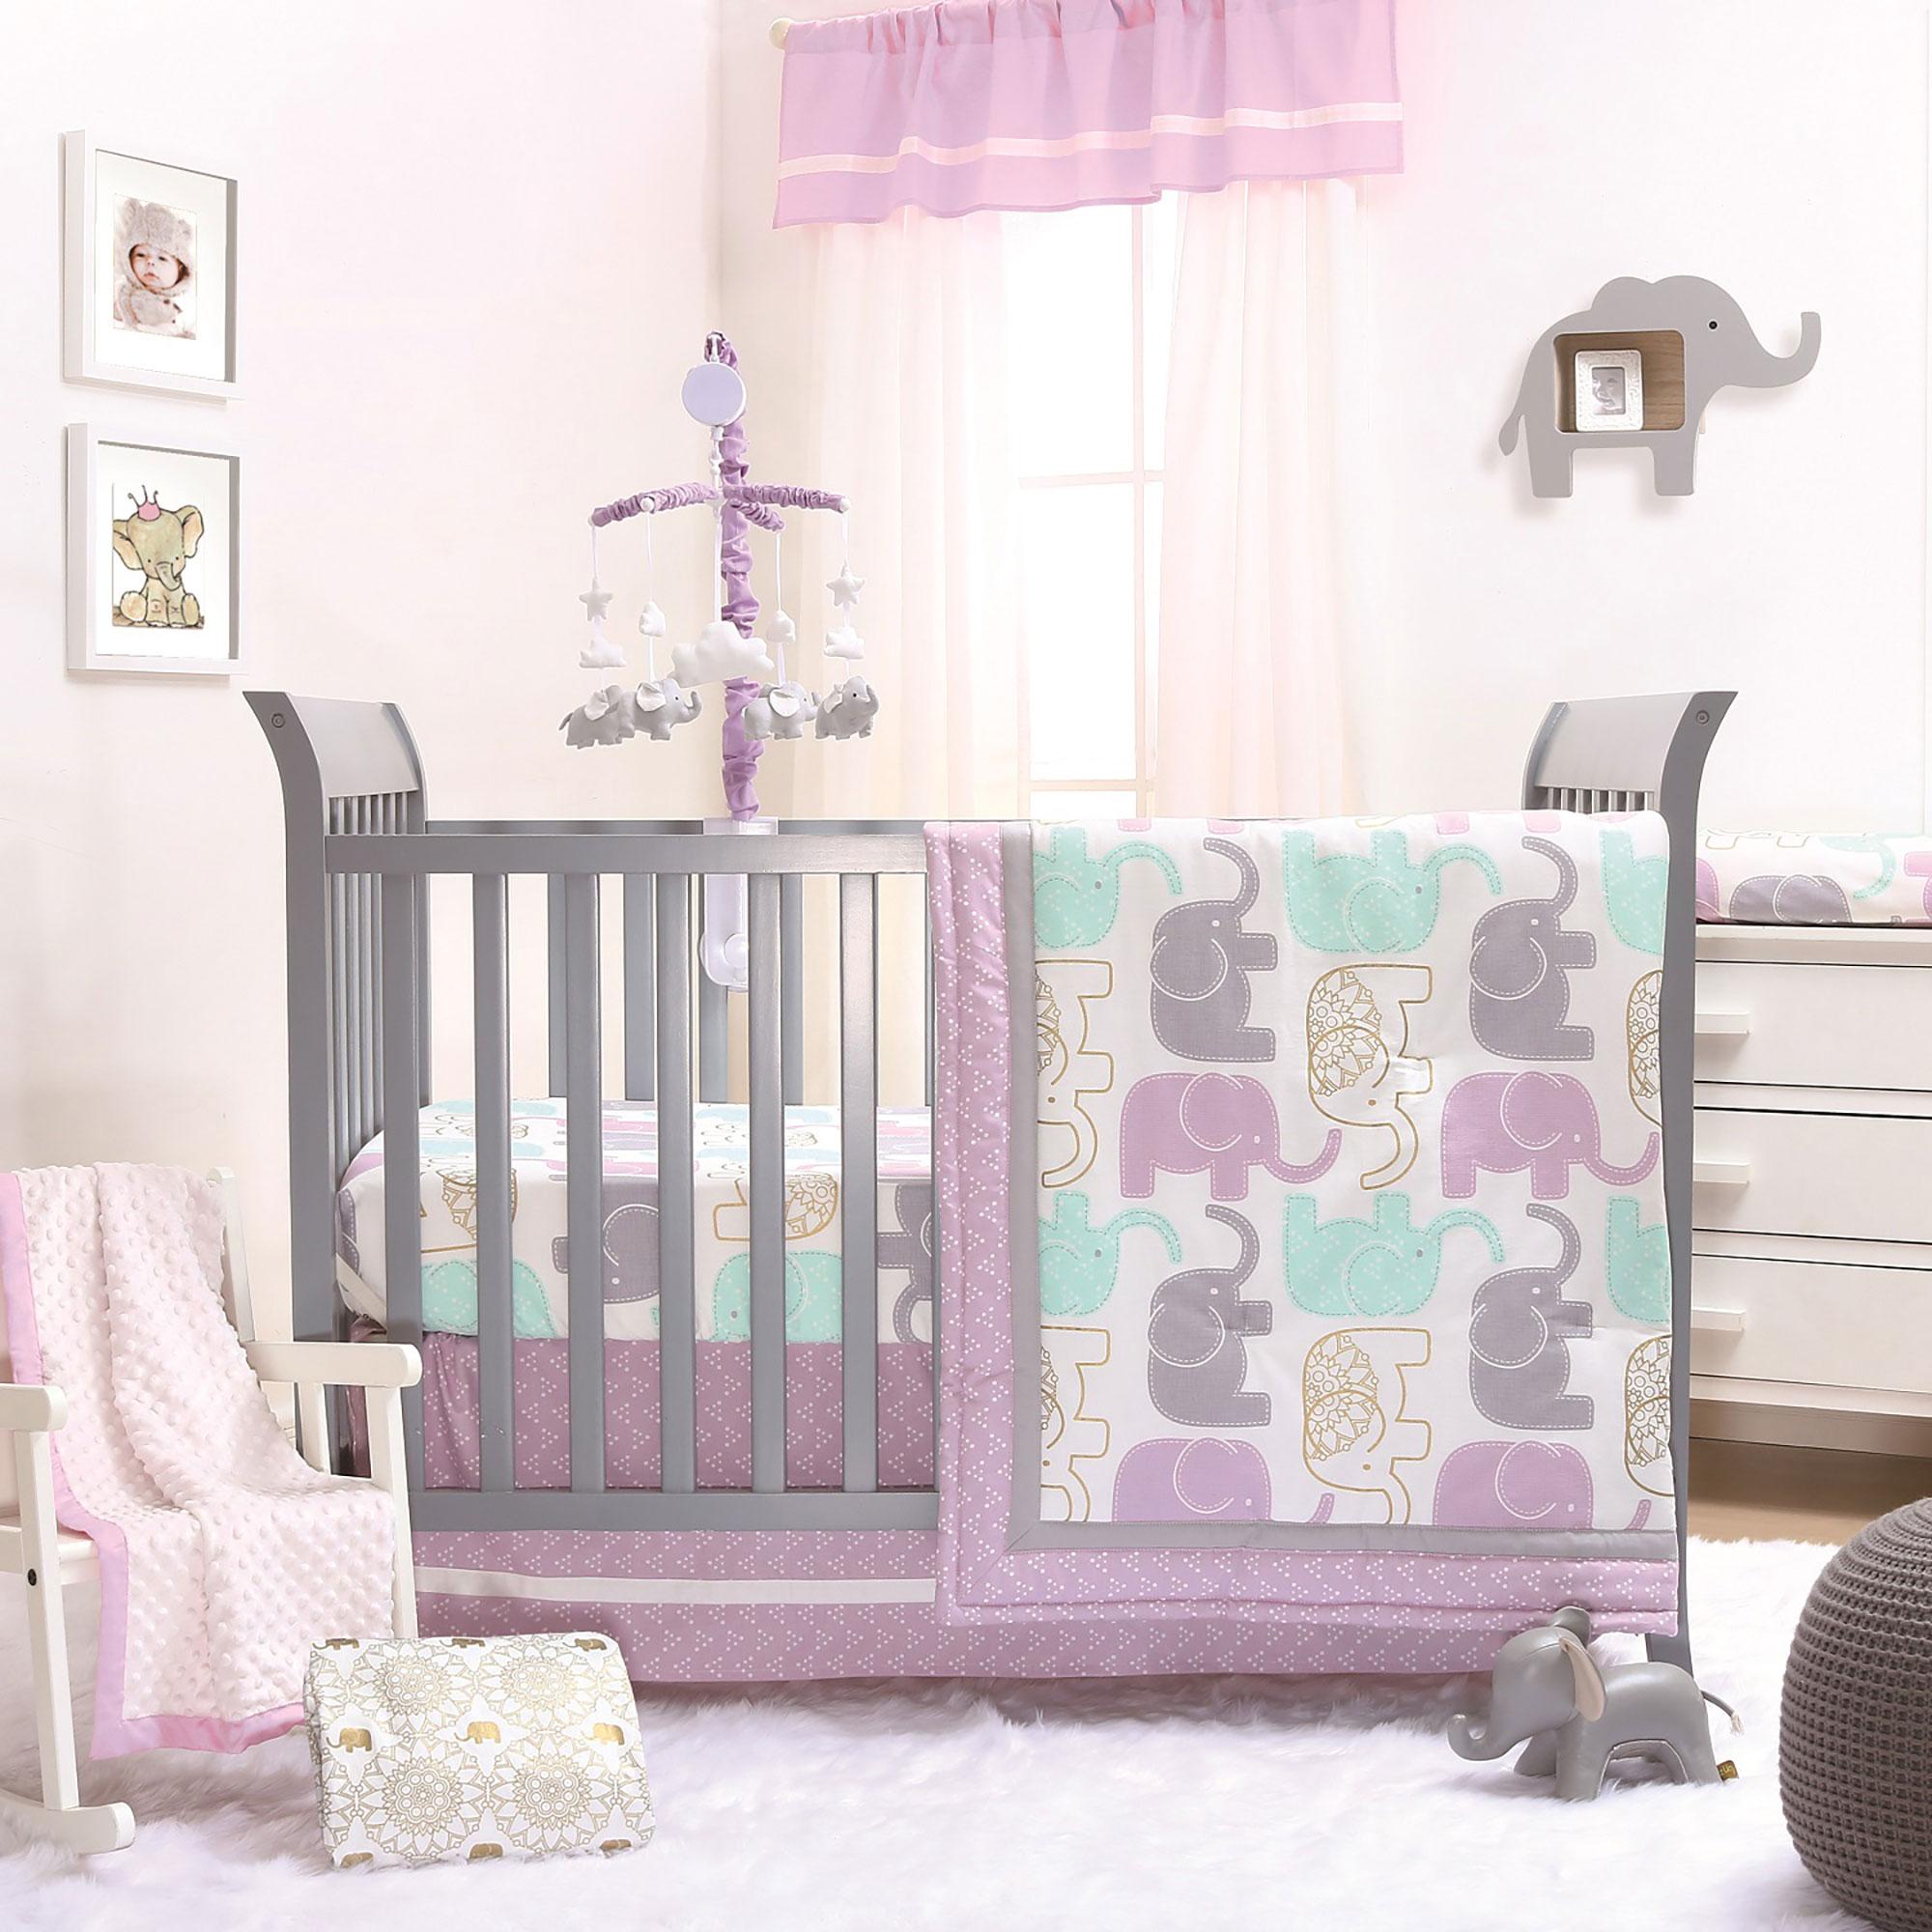 Little Peanut Lilac/Gold Elephant Baby Girl Crib Bedding - 11 Piece Sleep Essentials Set